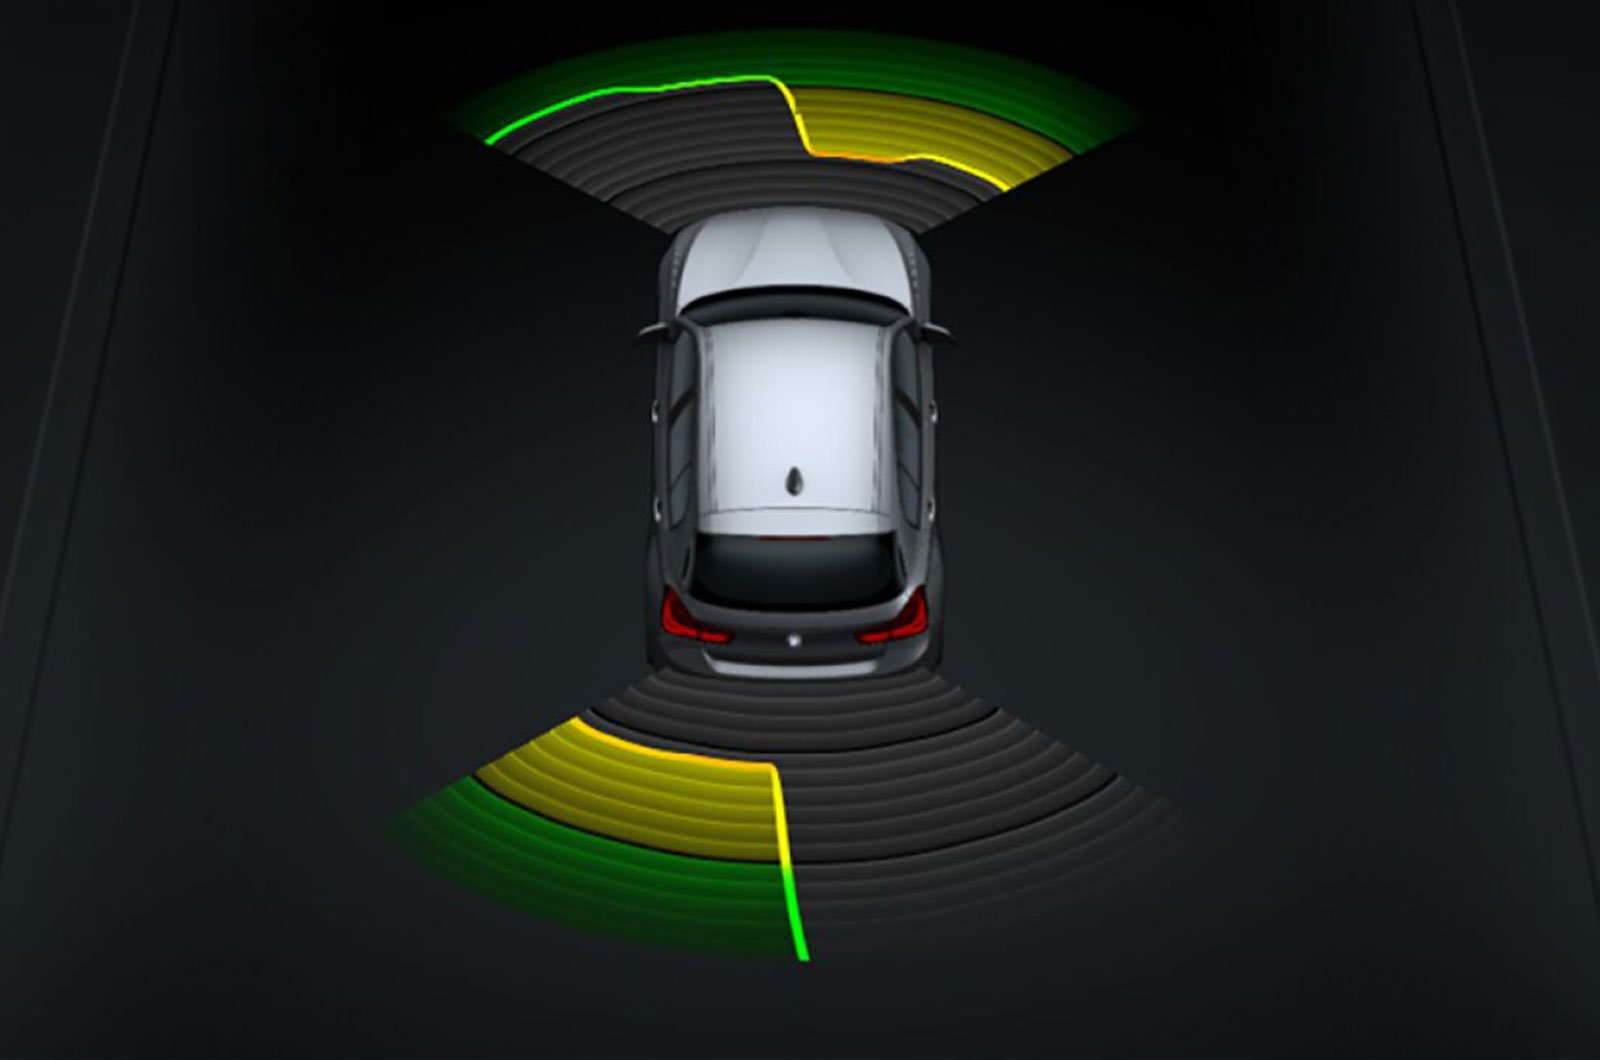 BMW 1 Series park distance control